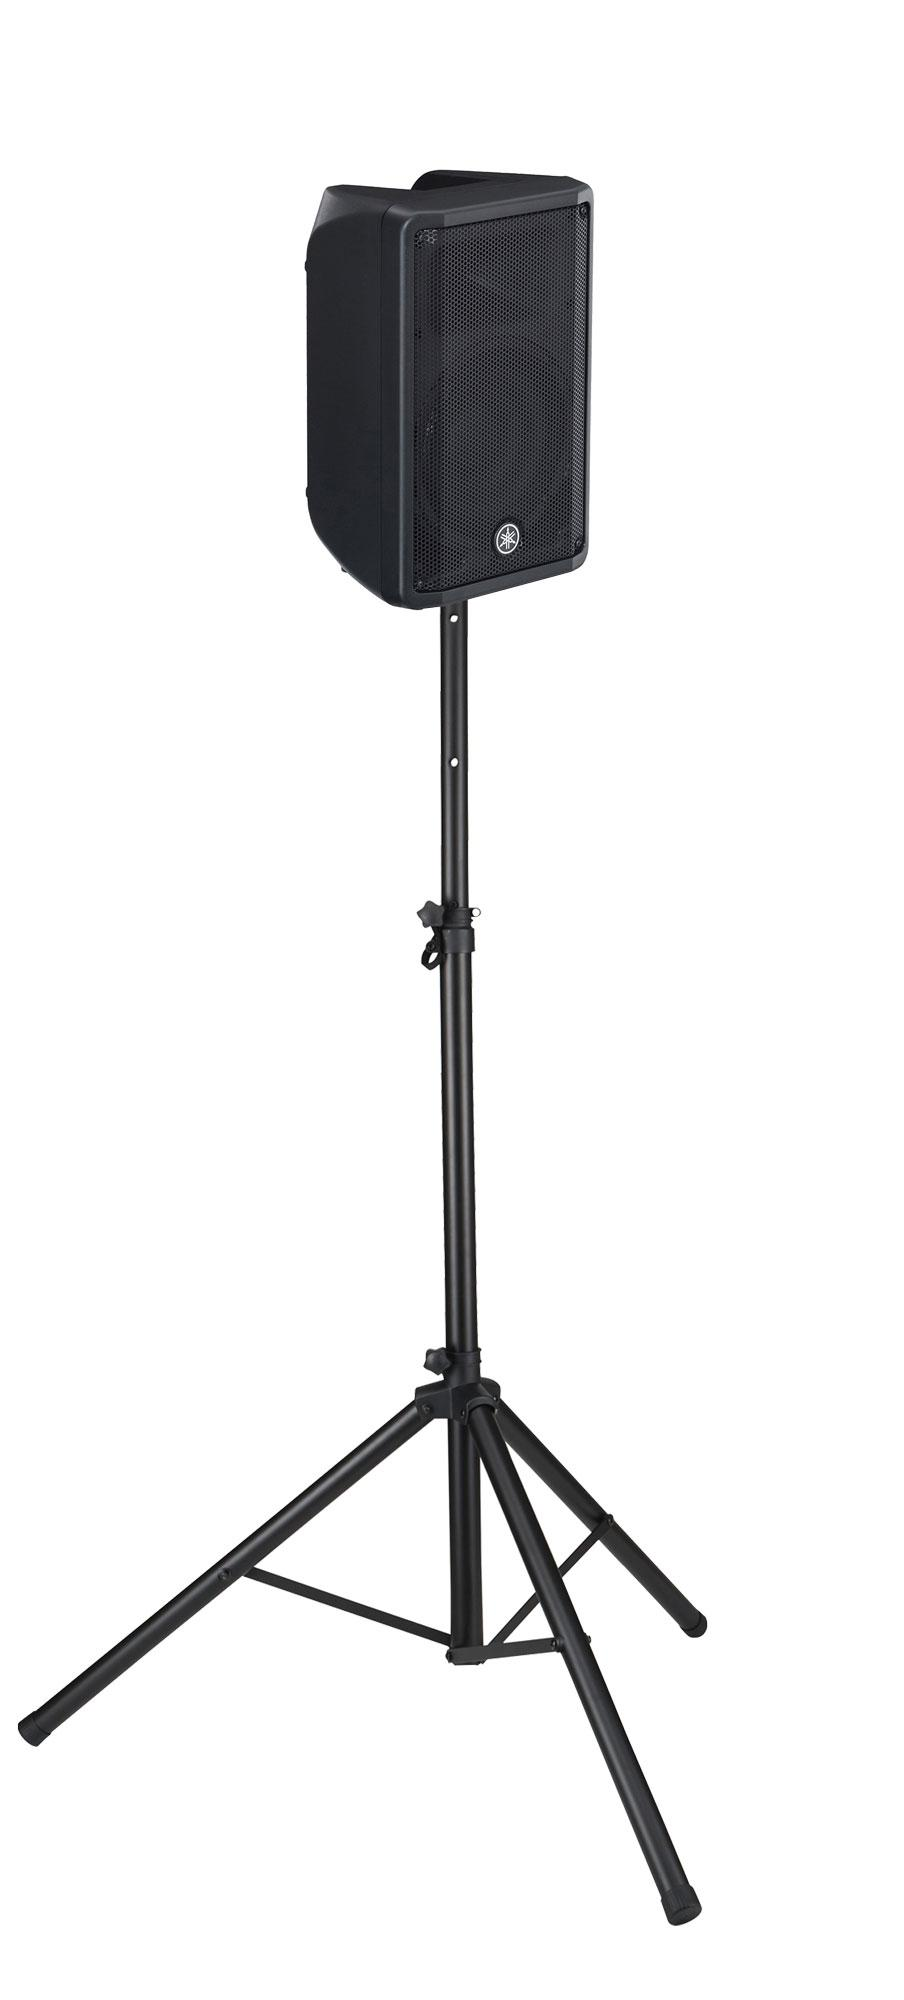 Paboxen - Yamaha CBR10 Passiv Box Set inkl. Stativ - Onlineshop Musikhaus Kirstein